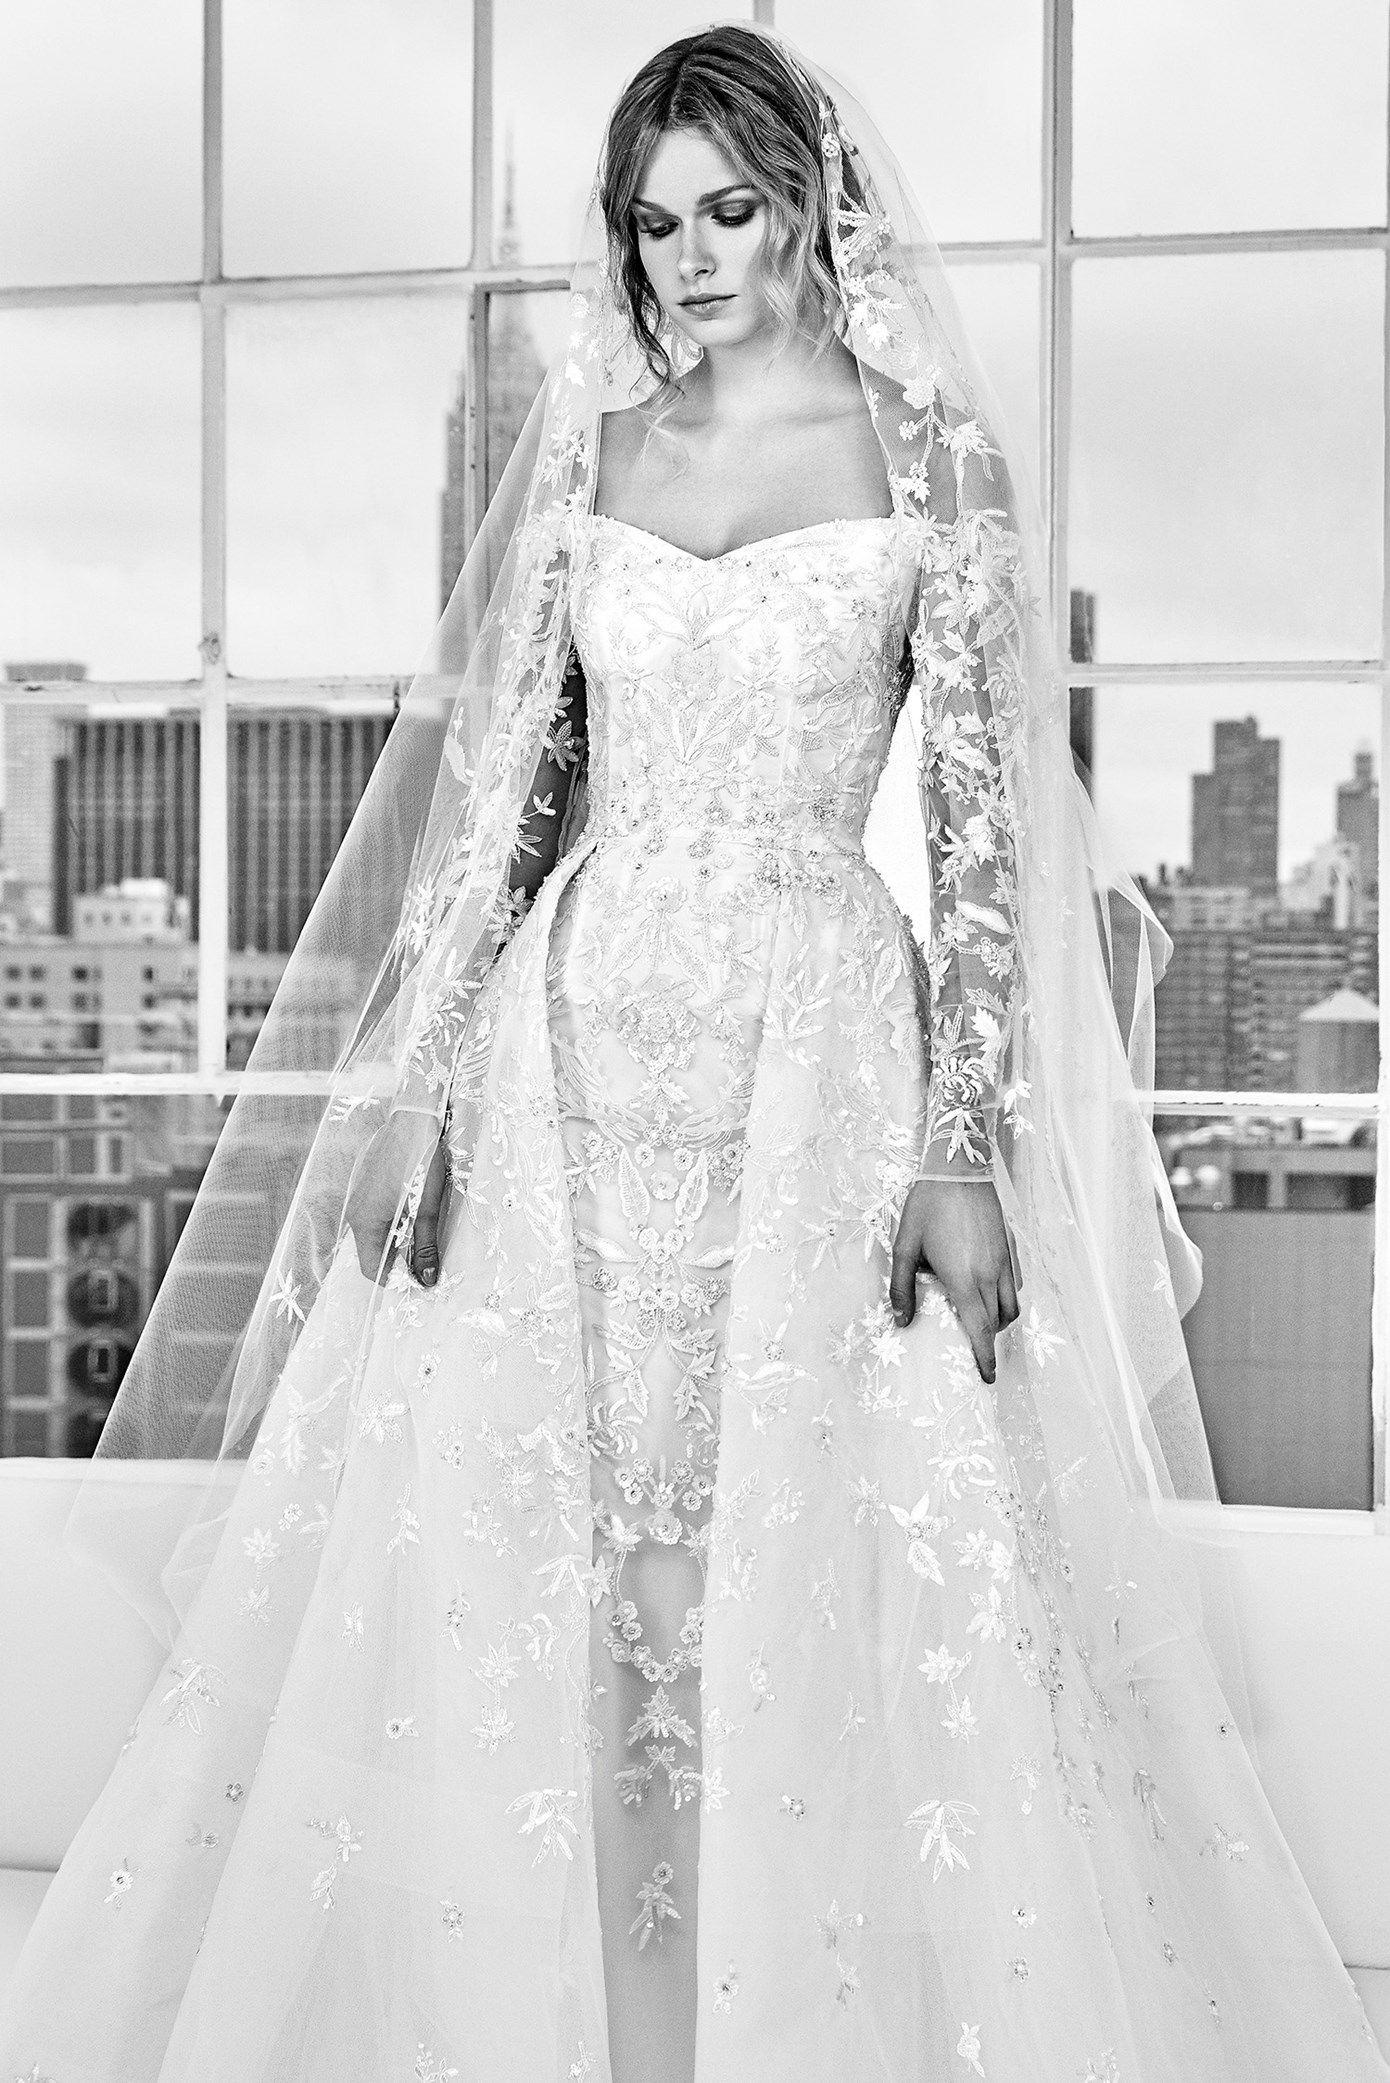 Zuhair Murad Spring 2018 Bridal Collection Designer Wedding Dresses Available At Designer B Wedding Dresses Zuhair Murad Zuhair Murad Bridal Wedding Dresses